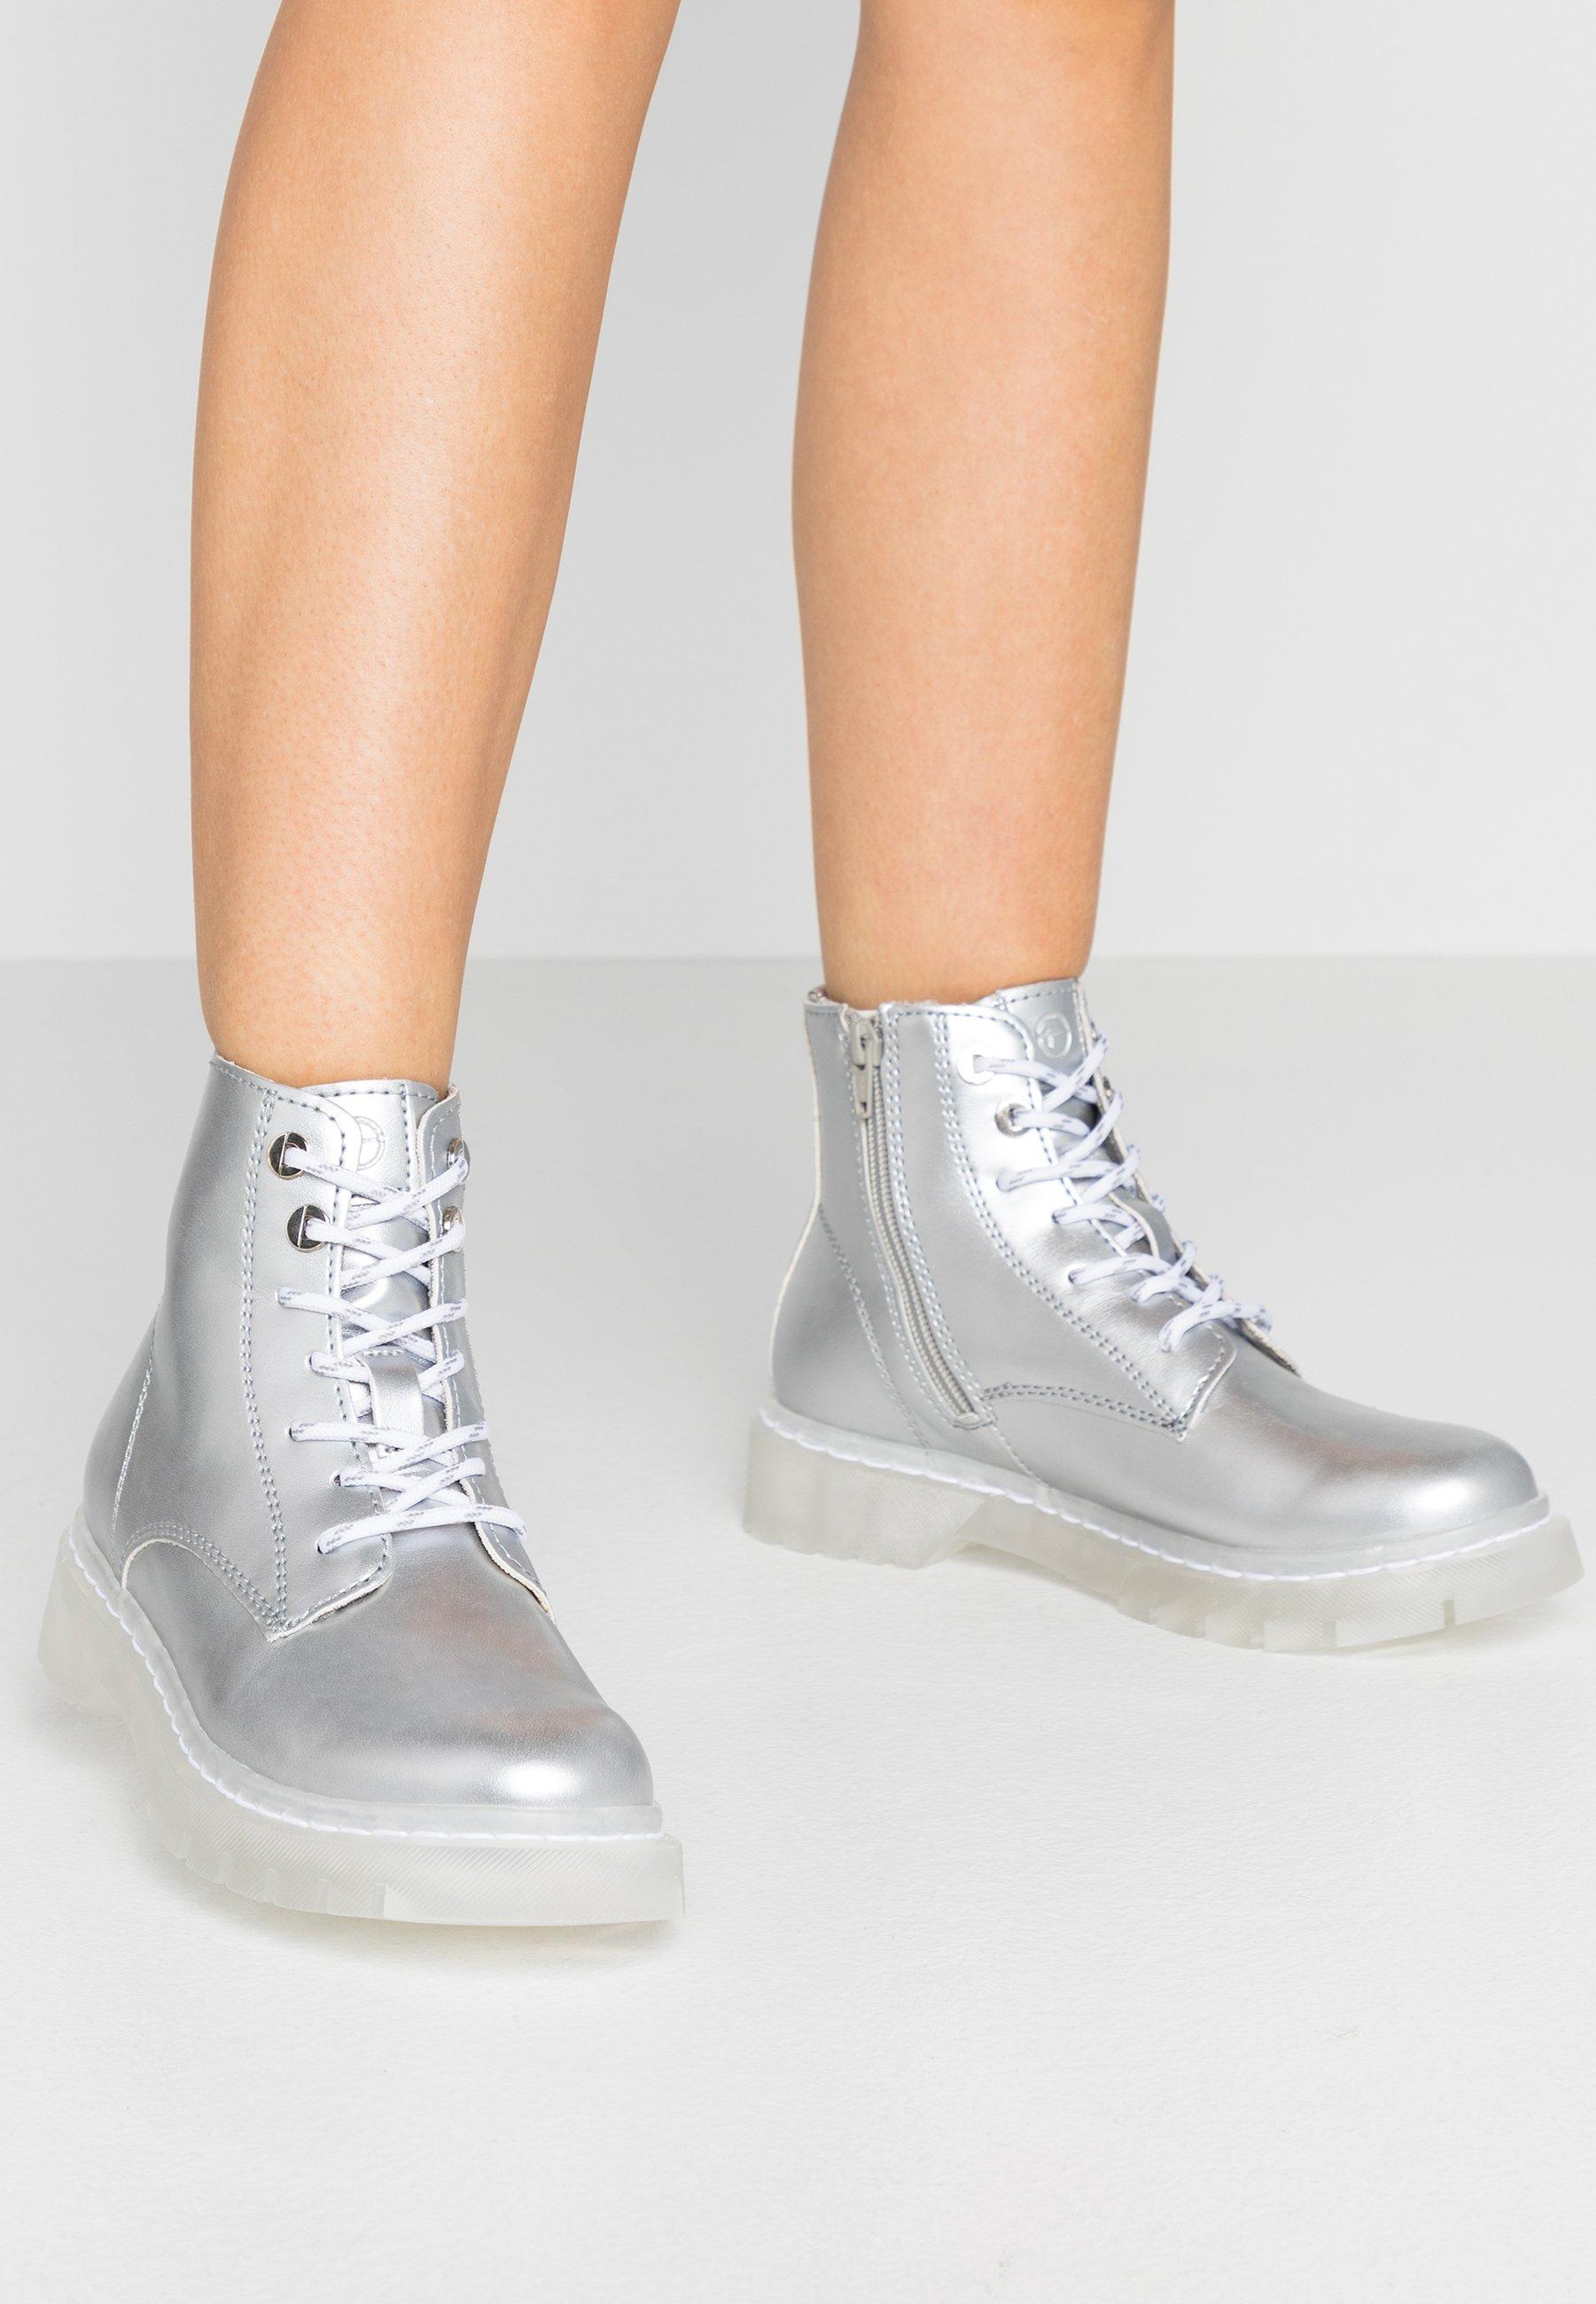 Tamaris Ankelboots - silver